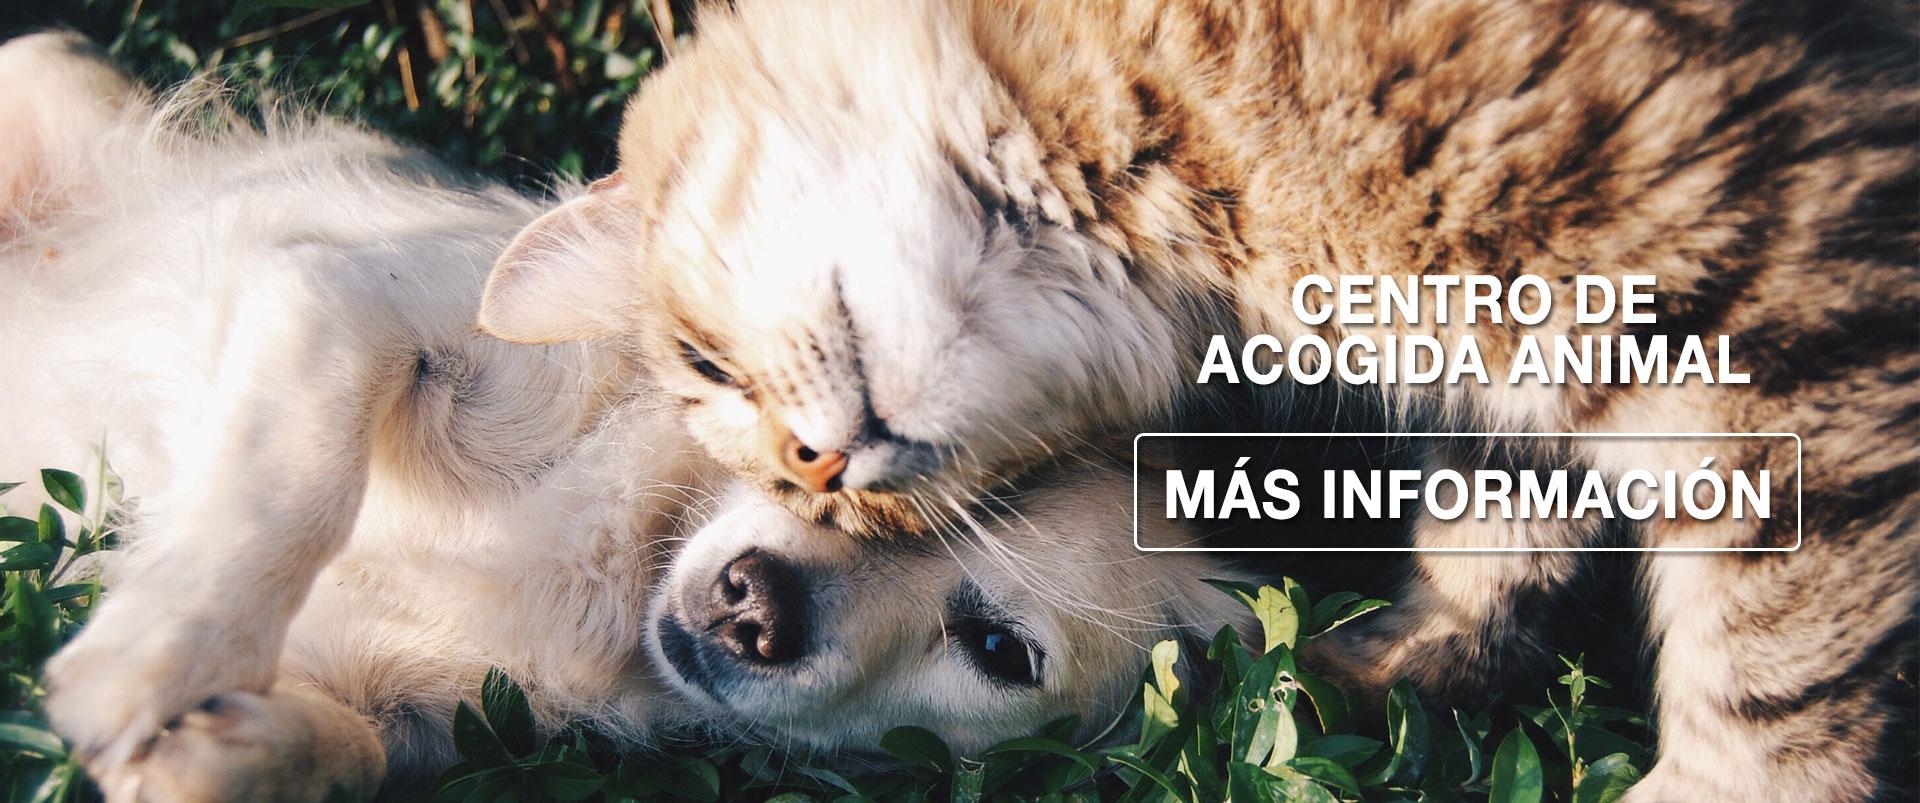 slide-acogida-animal